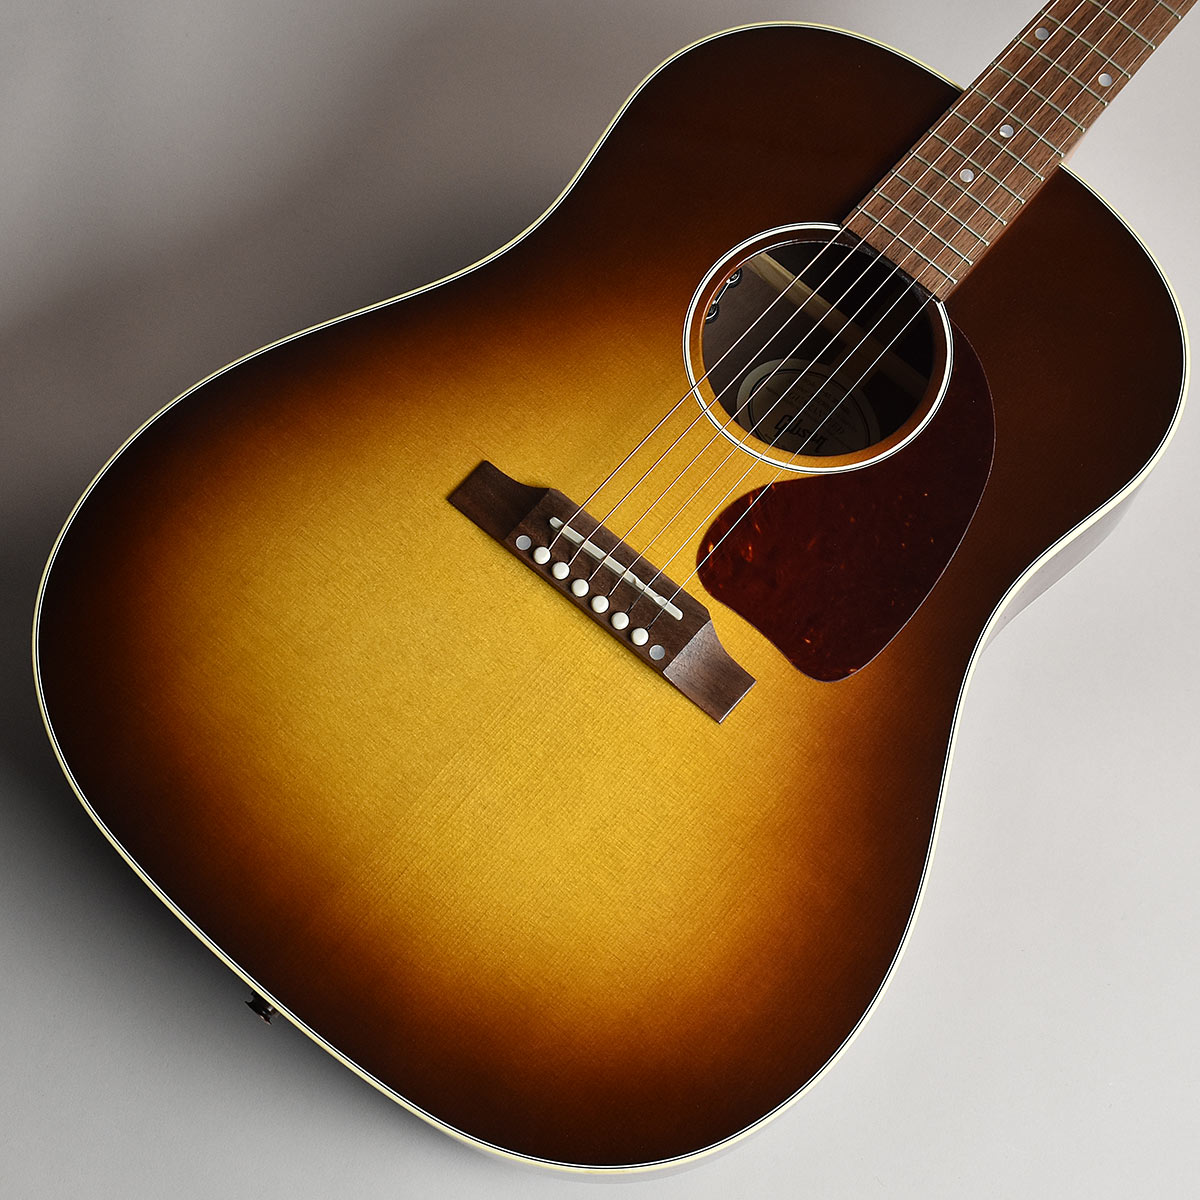 Gibson【ギブソン J-45 Studio 2019 Walnut Burst S/N:10029016 Burst 2019 エレアコ【ギブソン J45スタジオ】【未展示品】, アヅマムラ:17996fab --- officewill.xsrv.jp